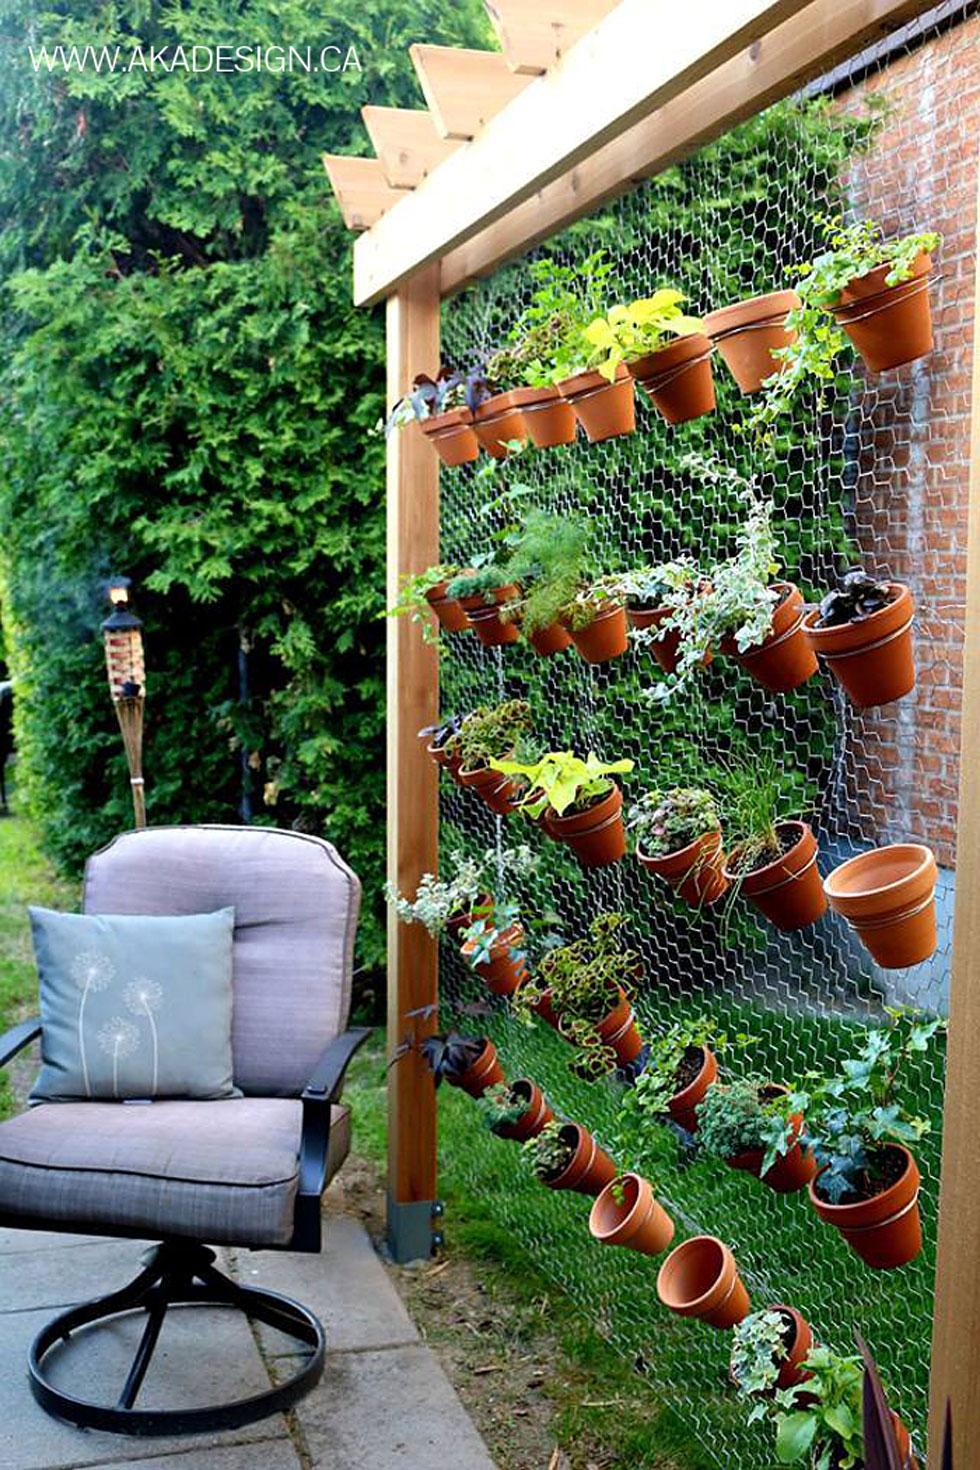 Sturdy Office Chair Diy Patio Decoration Ideas 2018 Diy Outdoor Patio Bar Ideas Diy Outdoor Patio Decorating Ideas Designs Hanging Chain Link Mini Planters outdoor Diy Backyard Patio Ideas